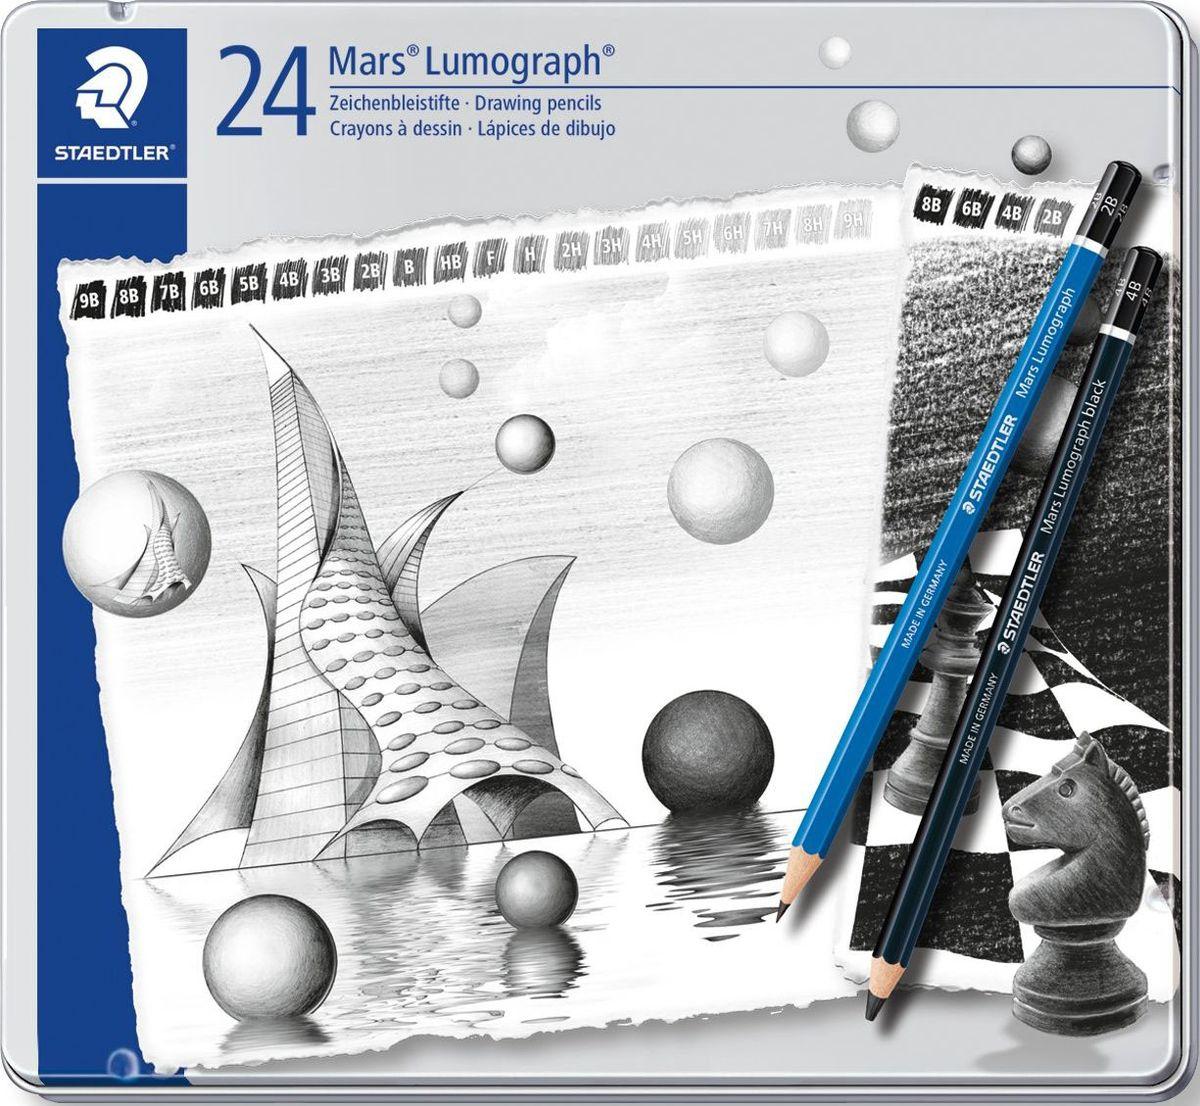 Staedtler Набор чернографитовых карандашей Mars Lumograph 100 24 шт 100G24S -  Карандаши